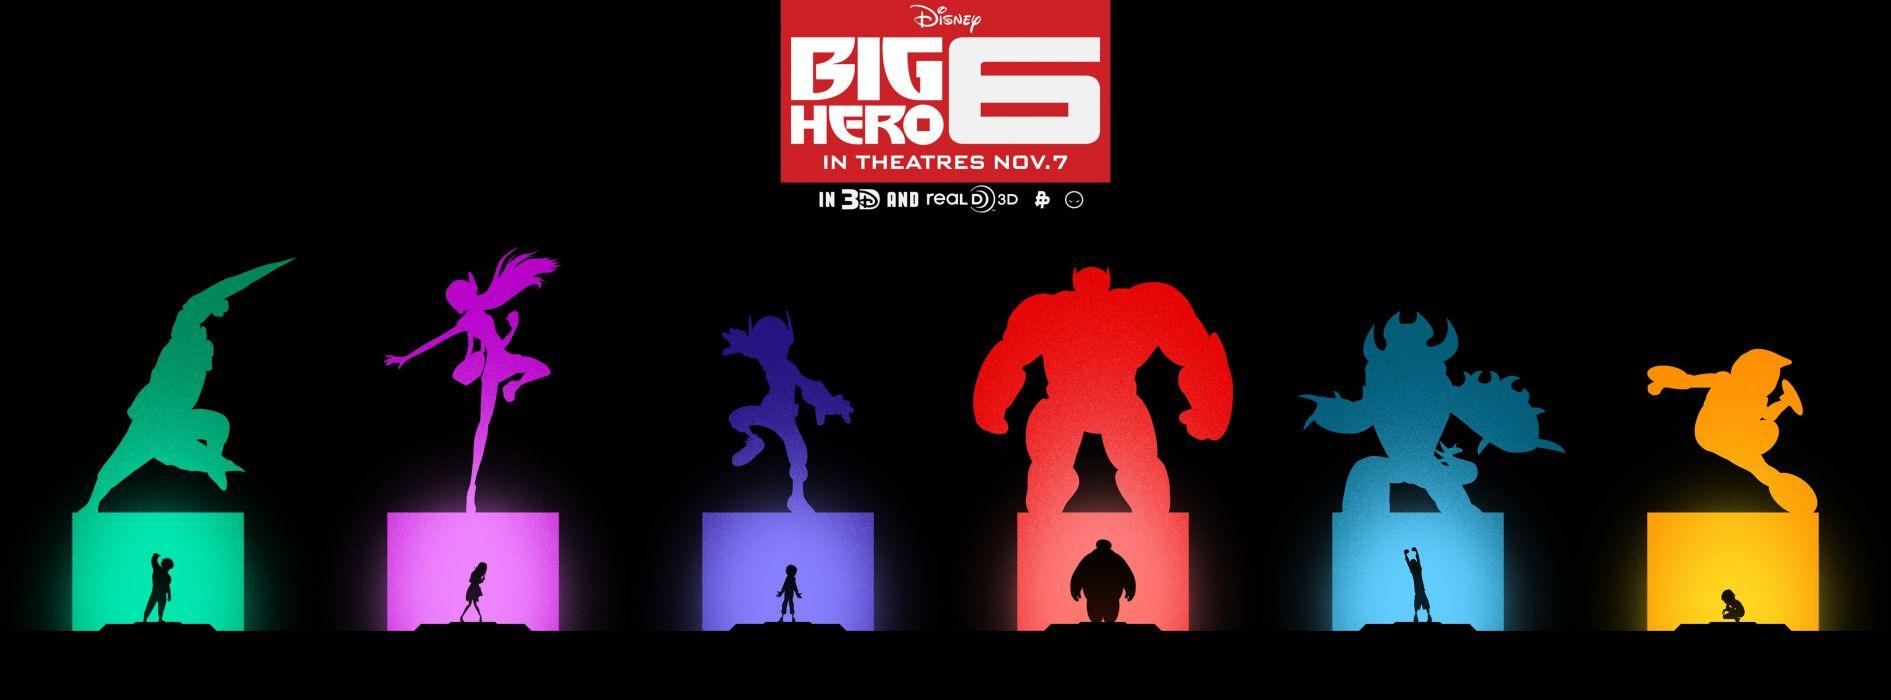 BIG-HERO-6 animation action adventure family robot cgi superhero big hero disney wallpaper